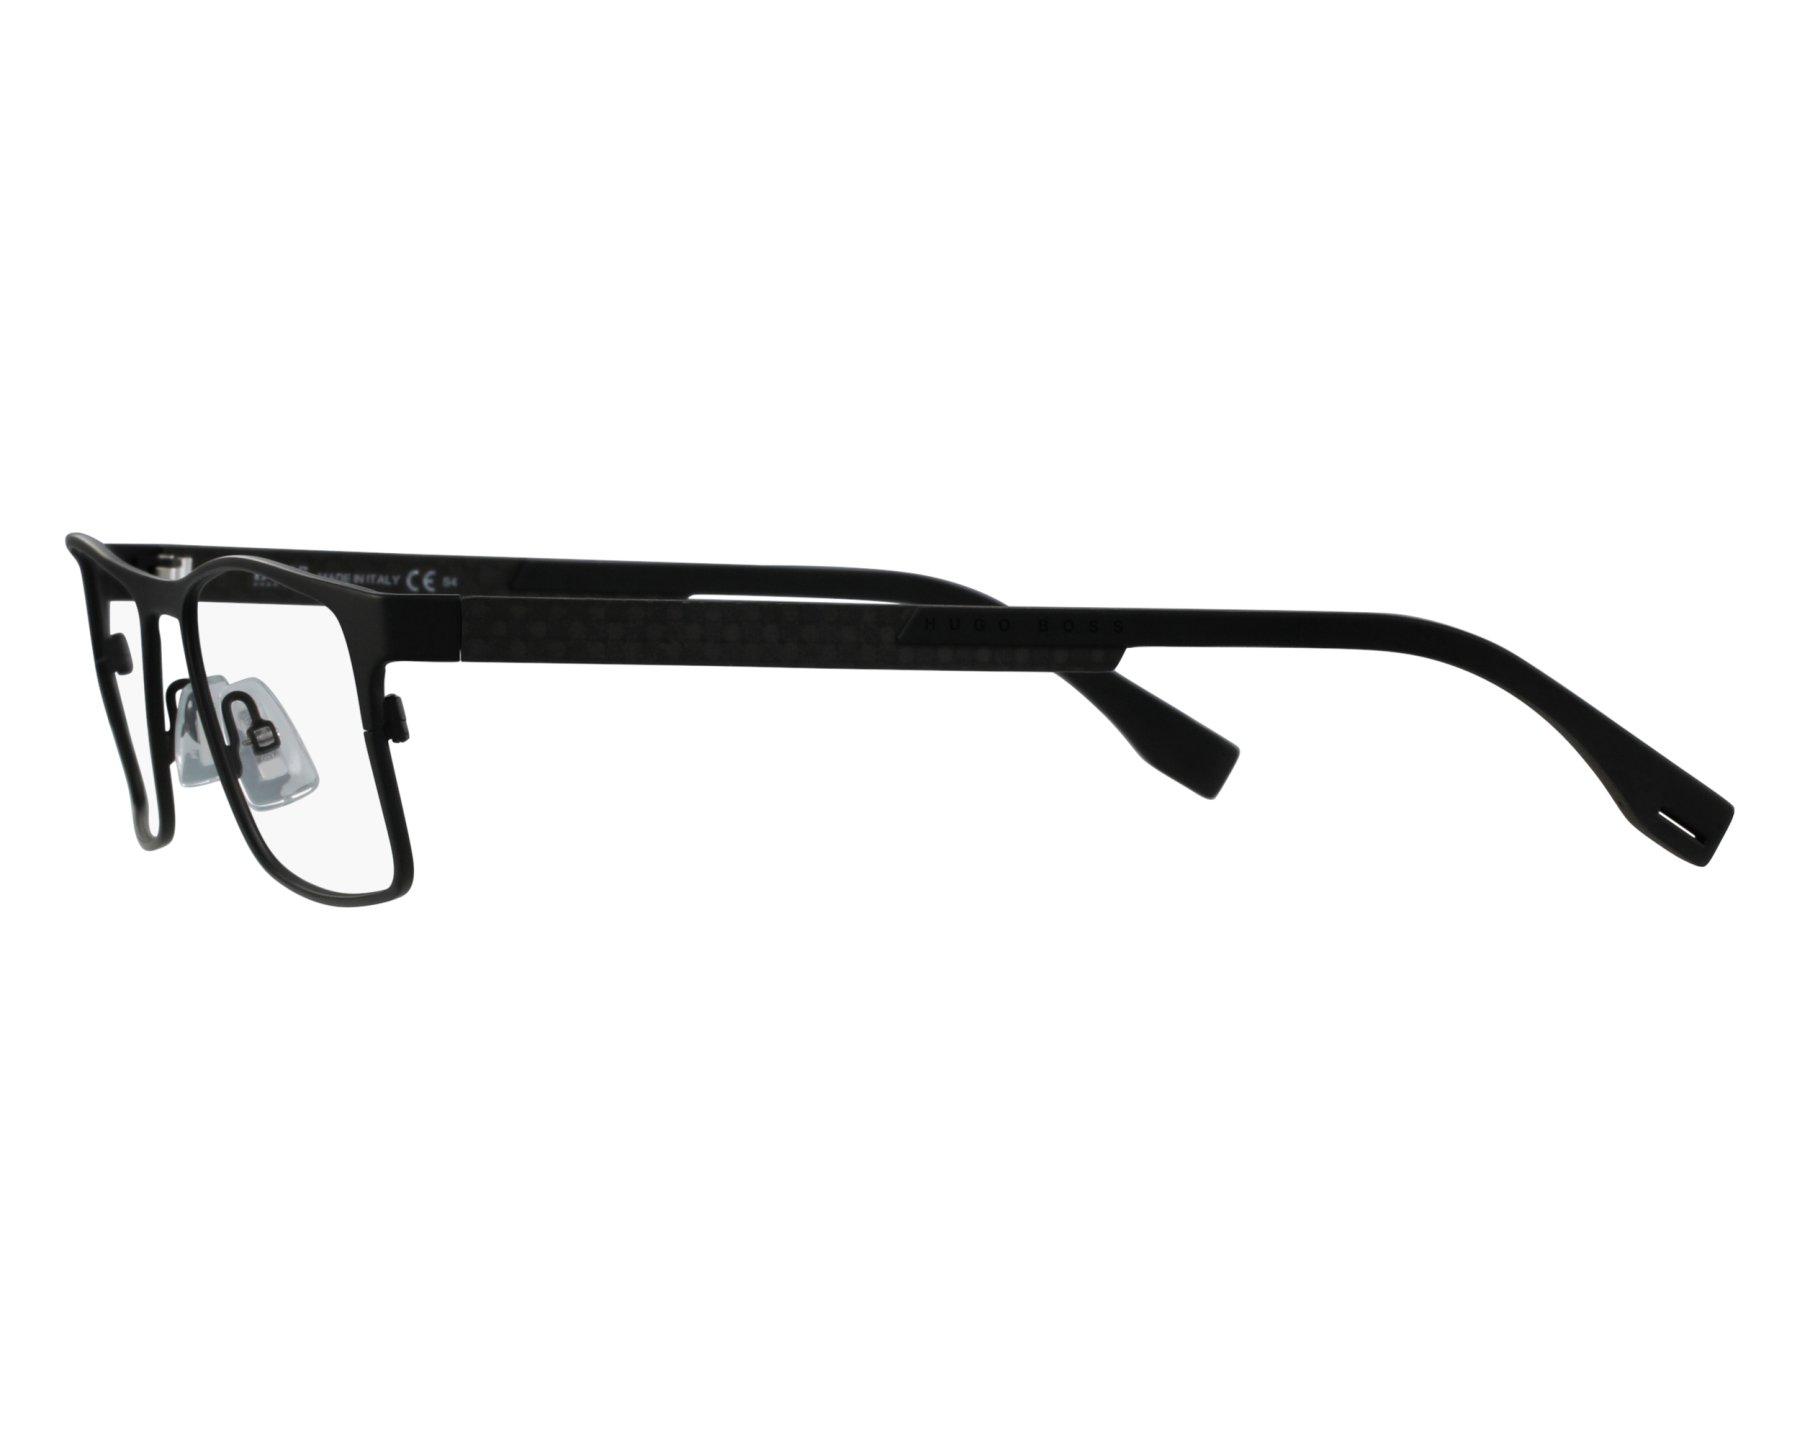 ae793eb98e8 eyeglasses Hugo Boss BOSS-0775 HXE 58-18 Black Carbon front view